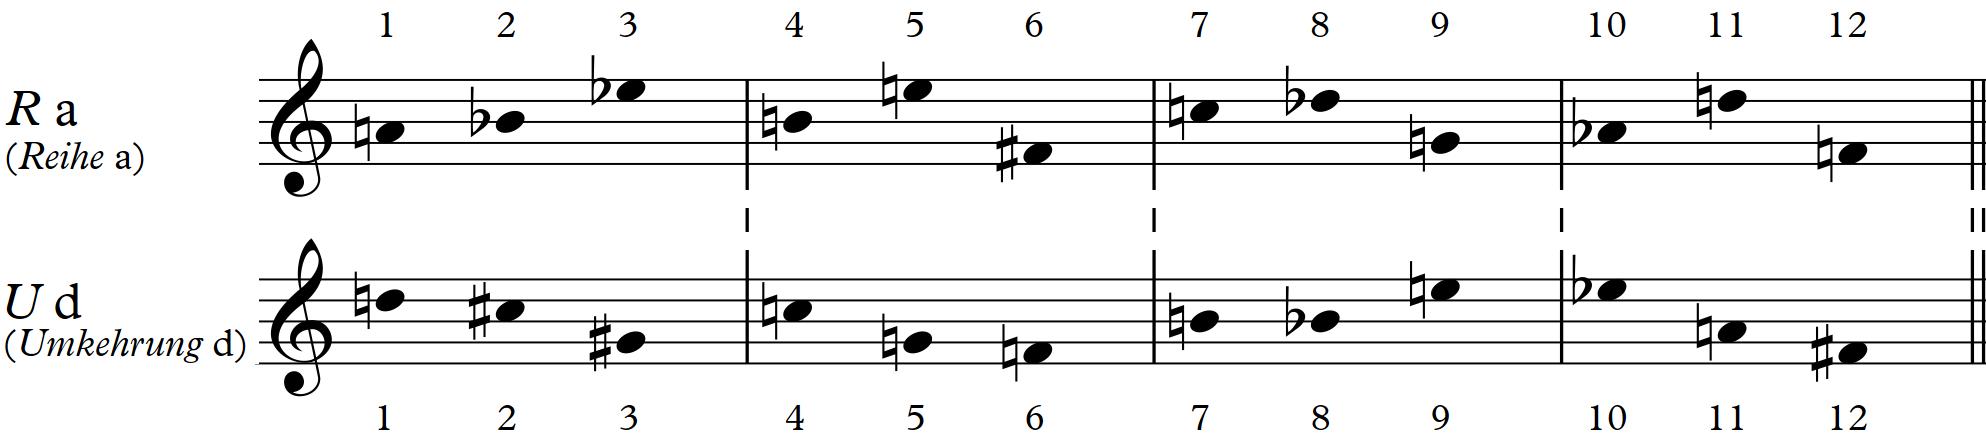 Schoenberg vc 0020.png